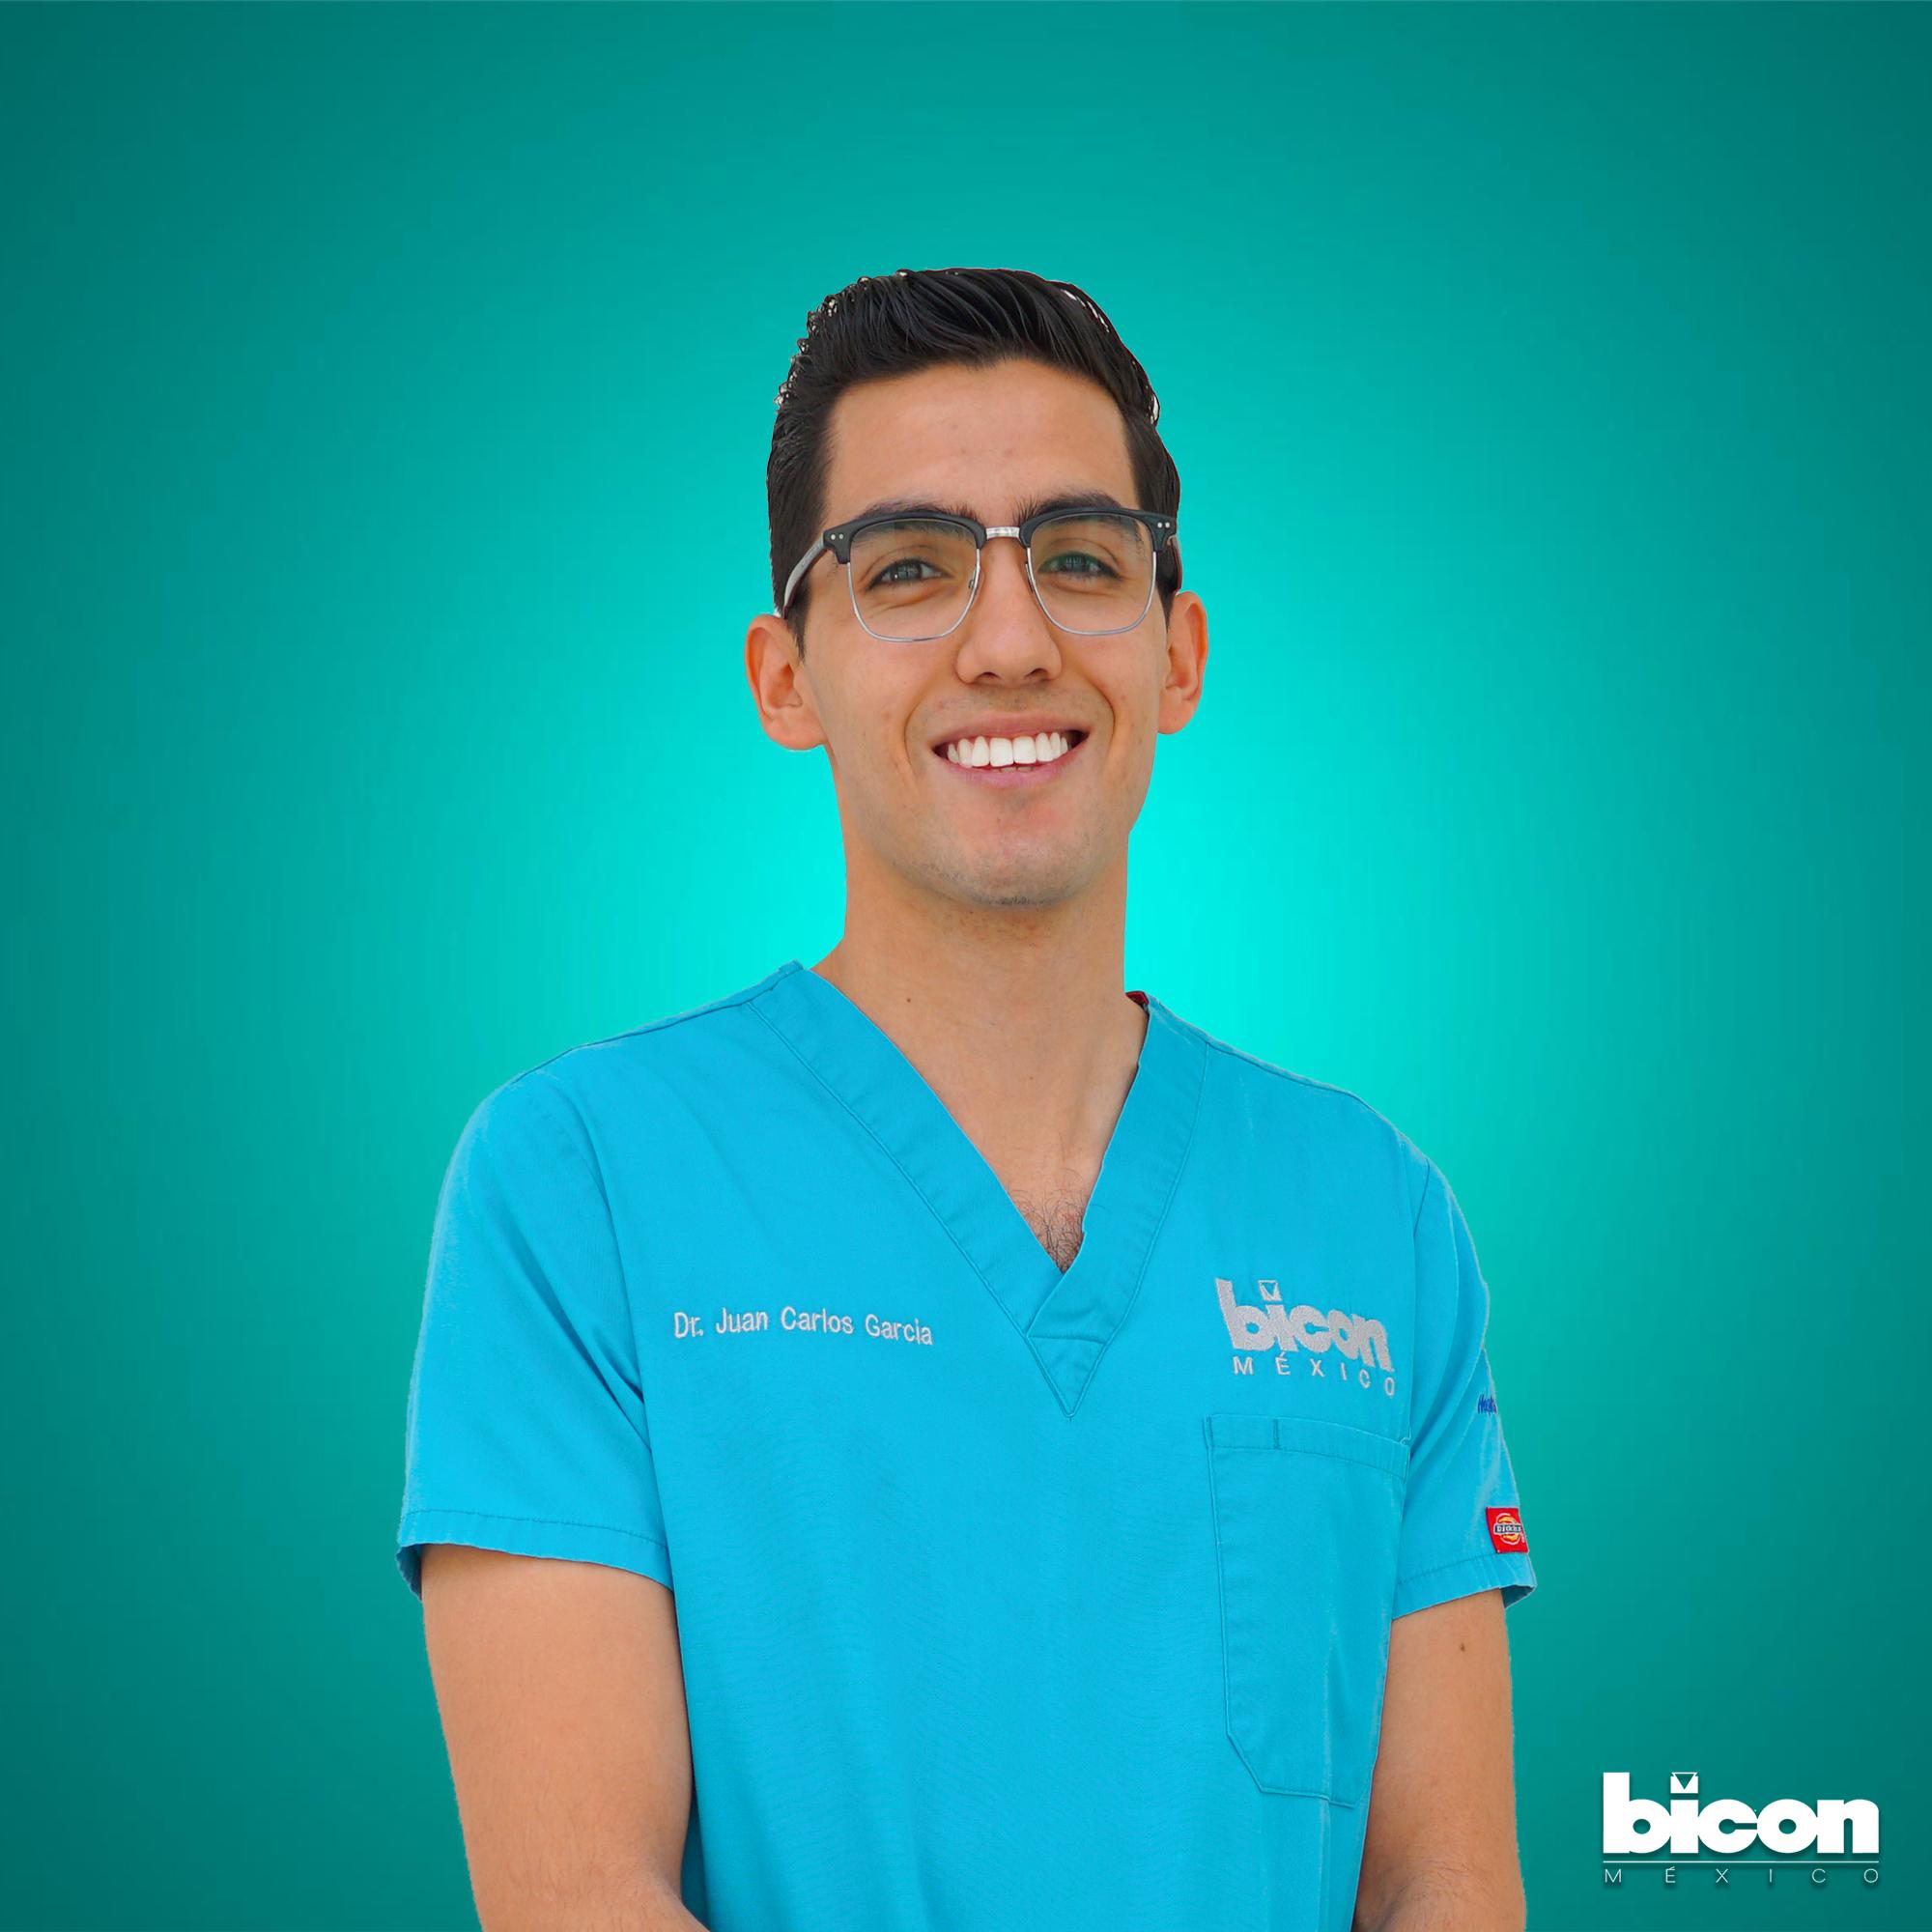 https://mexicoimplantdentistry.com/wp-content/uploads/2021/04/Juan-Carlos-Garcia-Elizalde.jpg